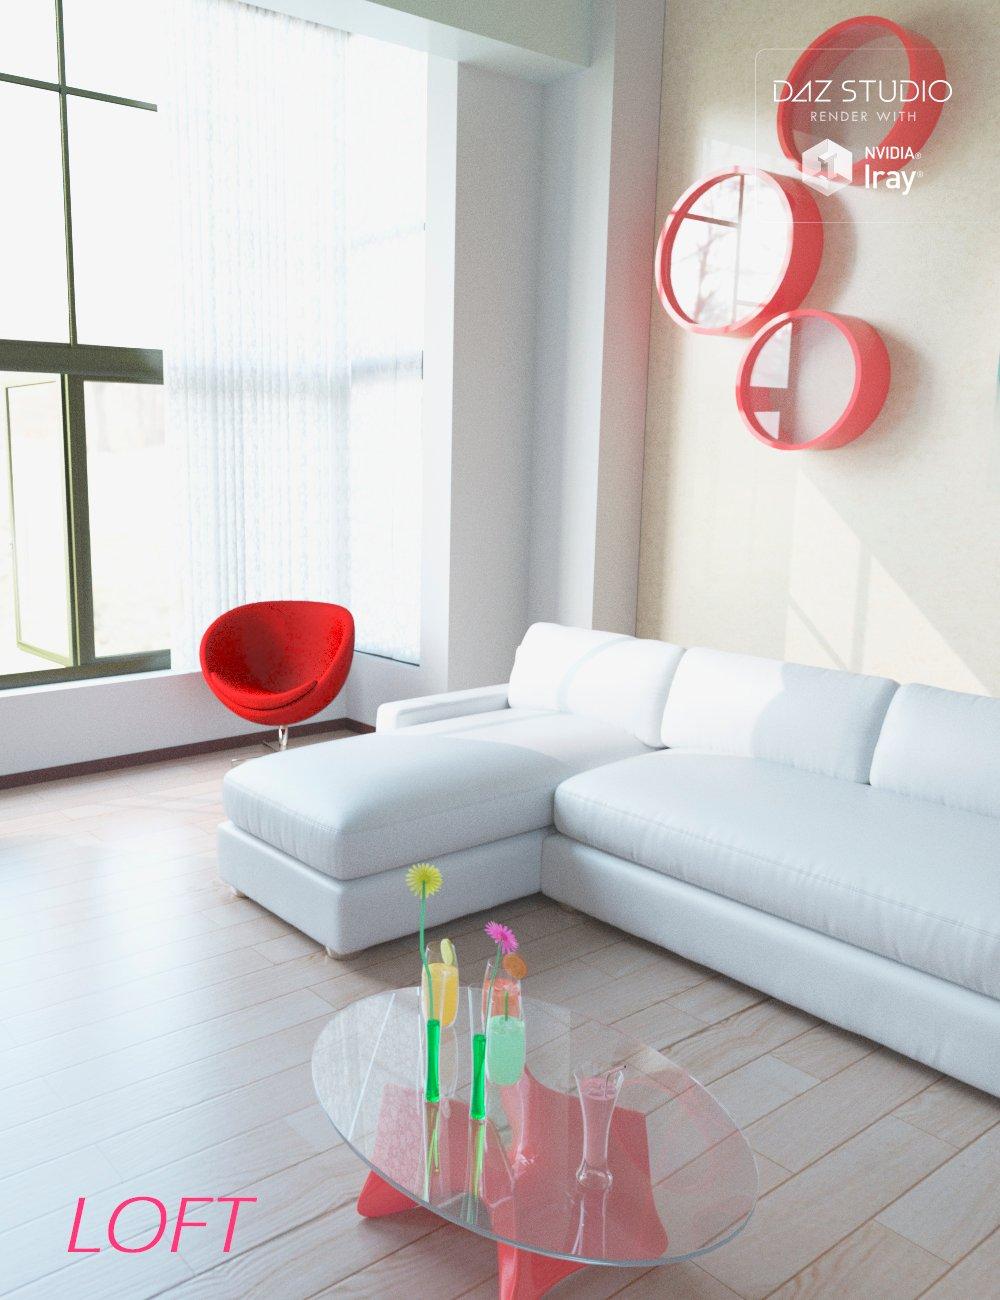 Contemporary Loft by: Human, 3D Models by Daz 3D